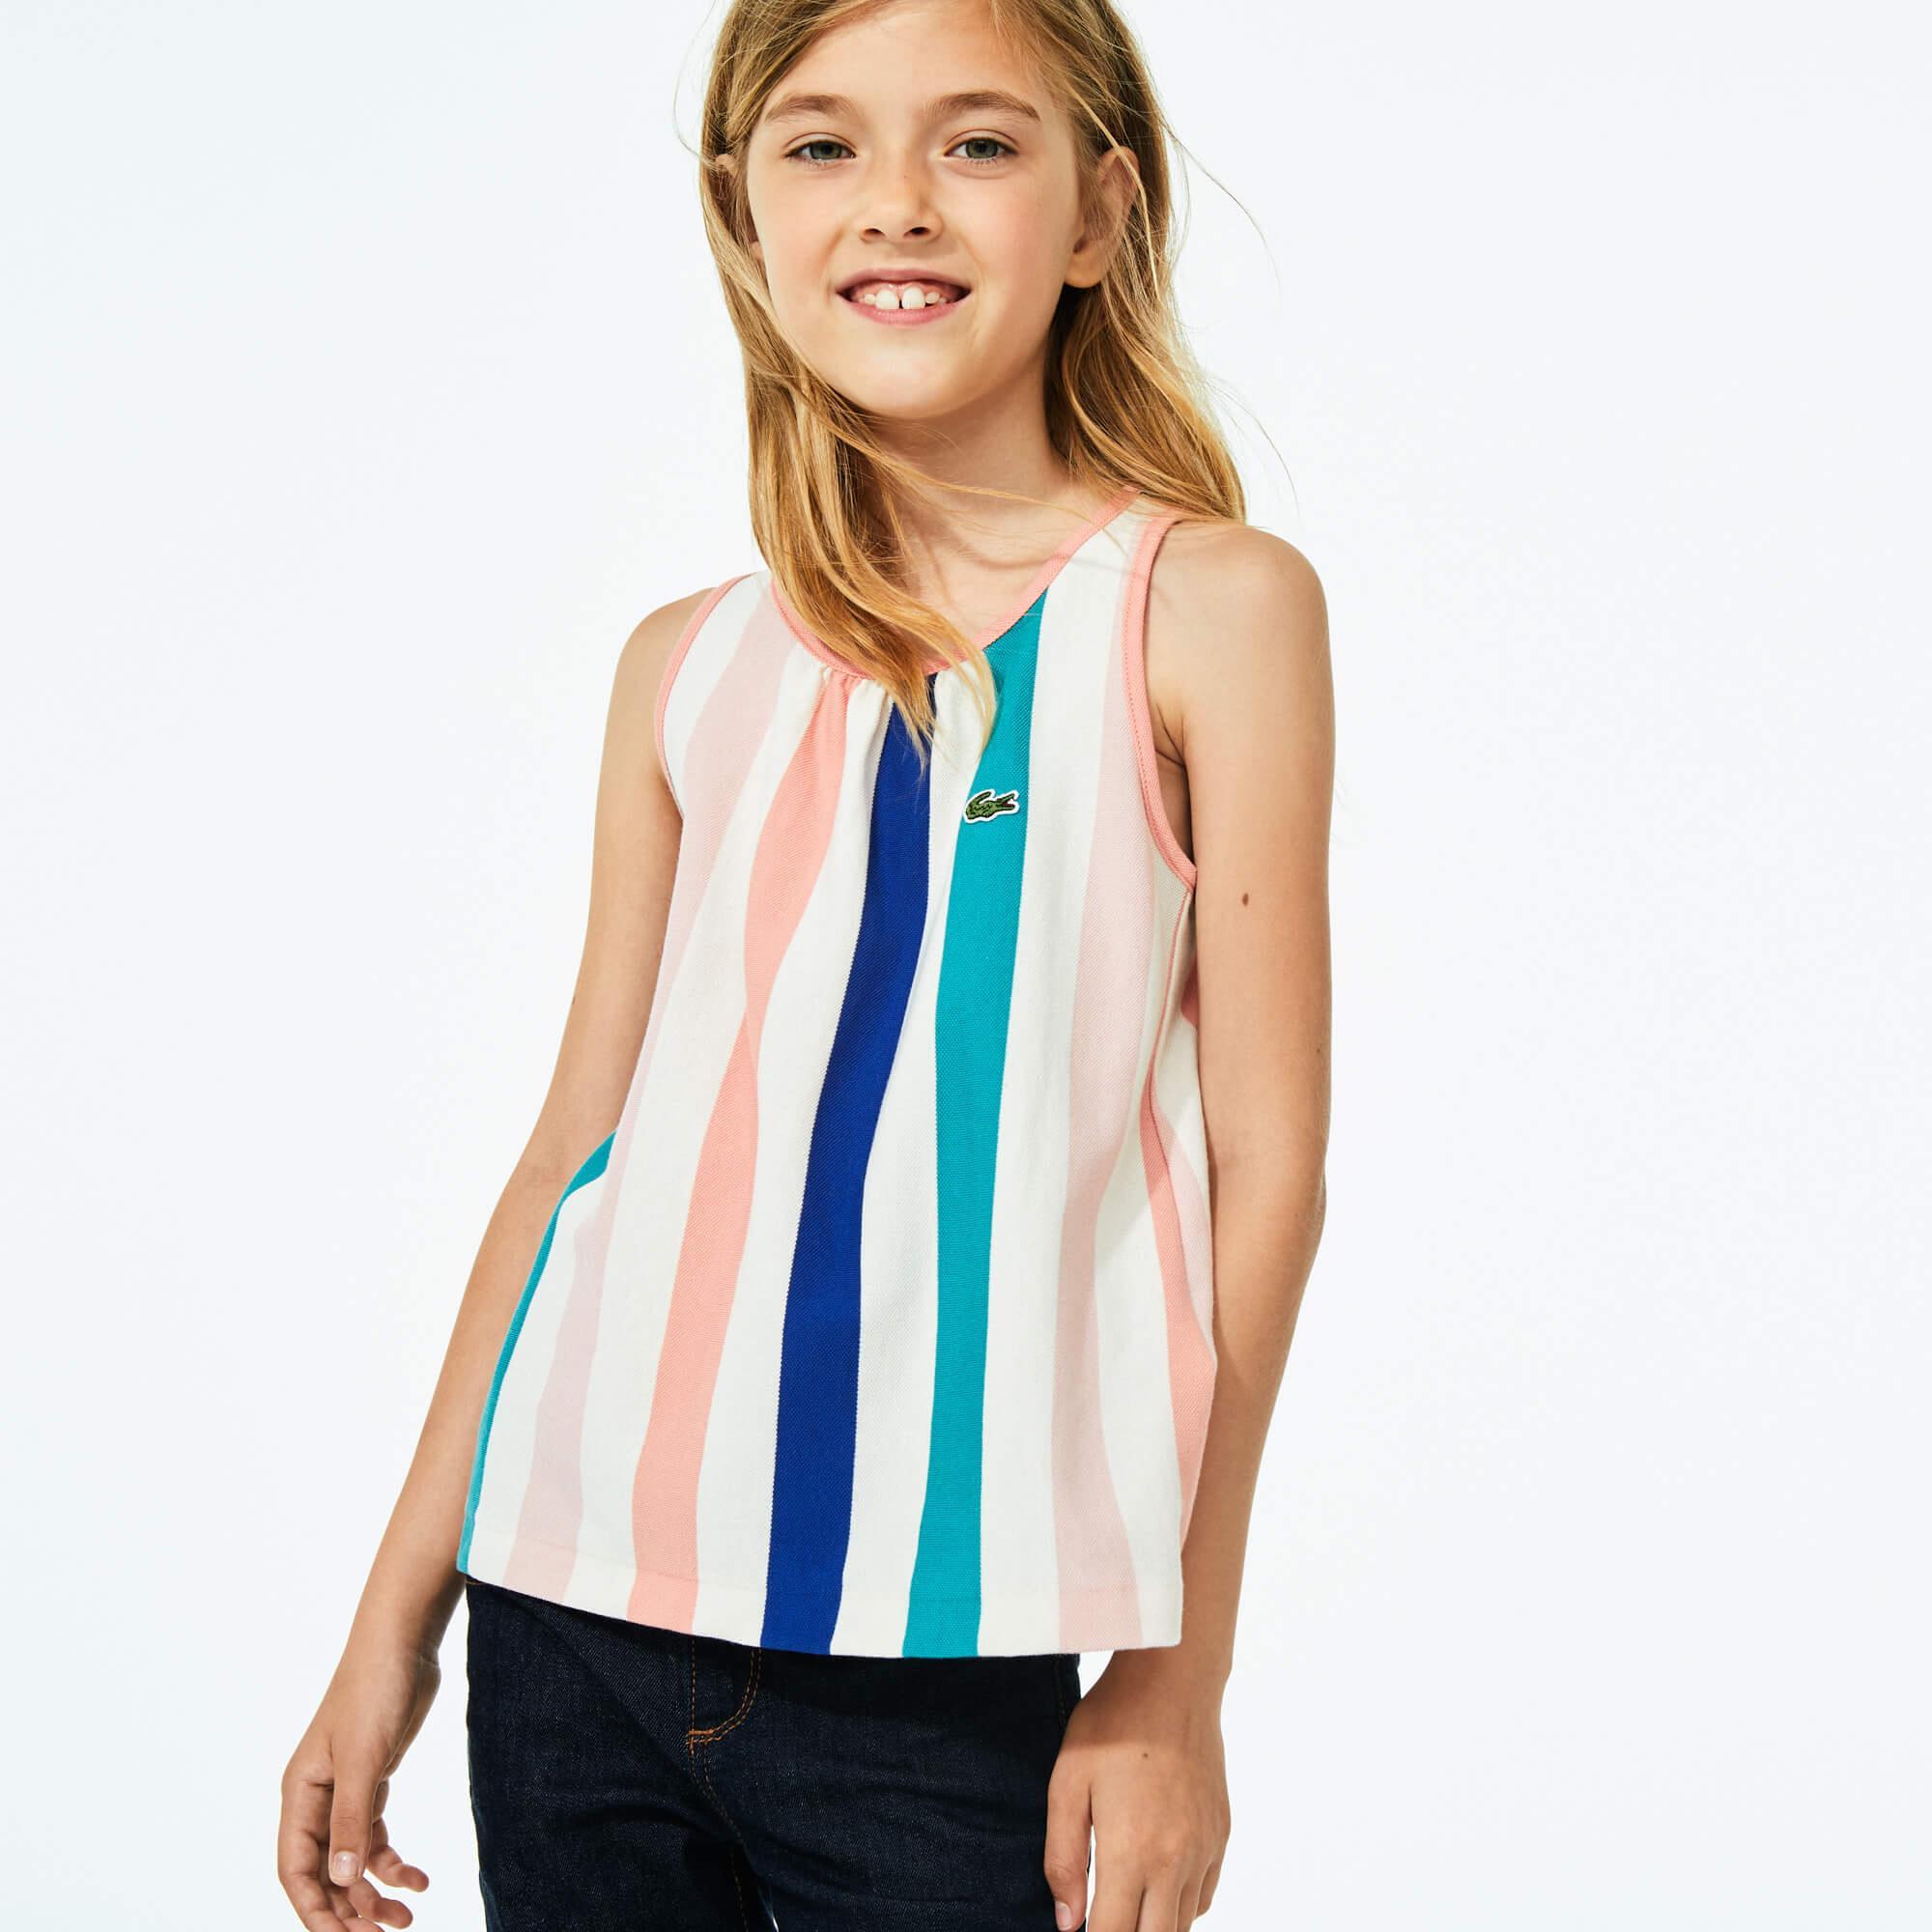 Lacoste Çocuk Bisiklet Yaka Çizgili Kolsuz Renkli T-Shirt